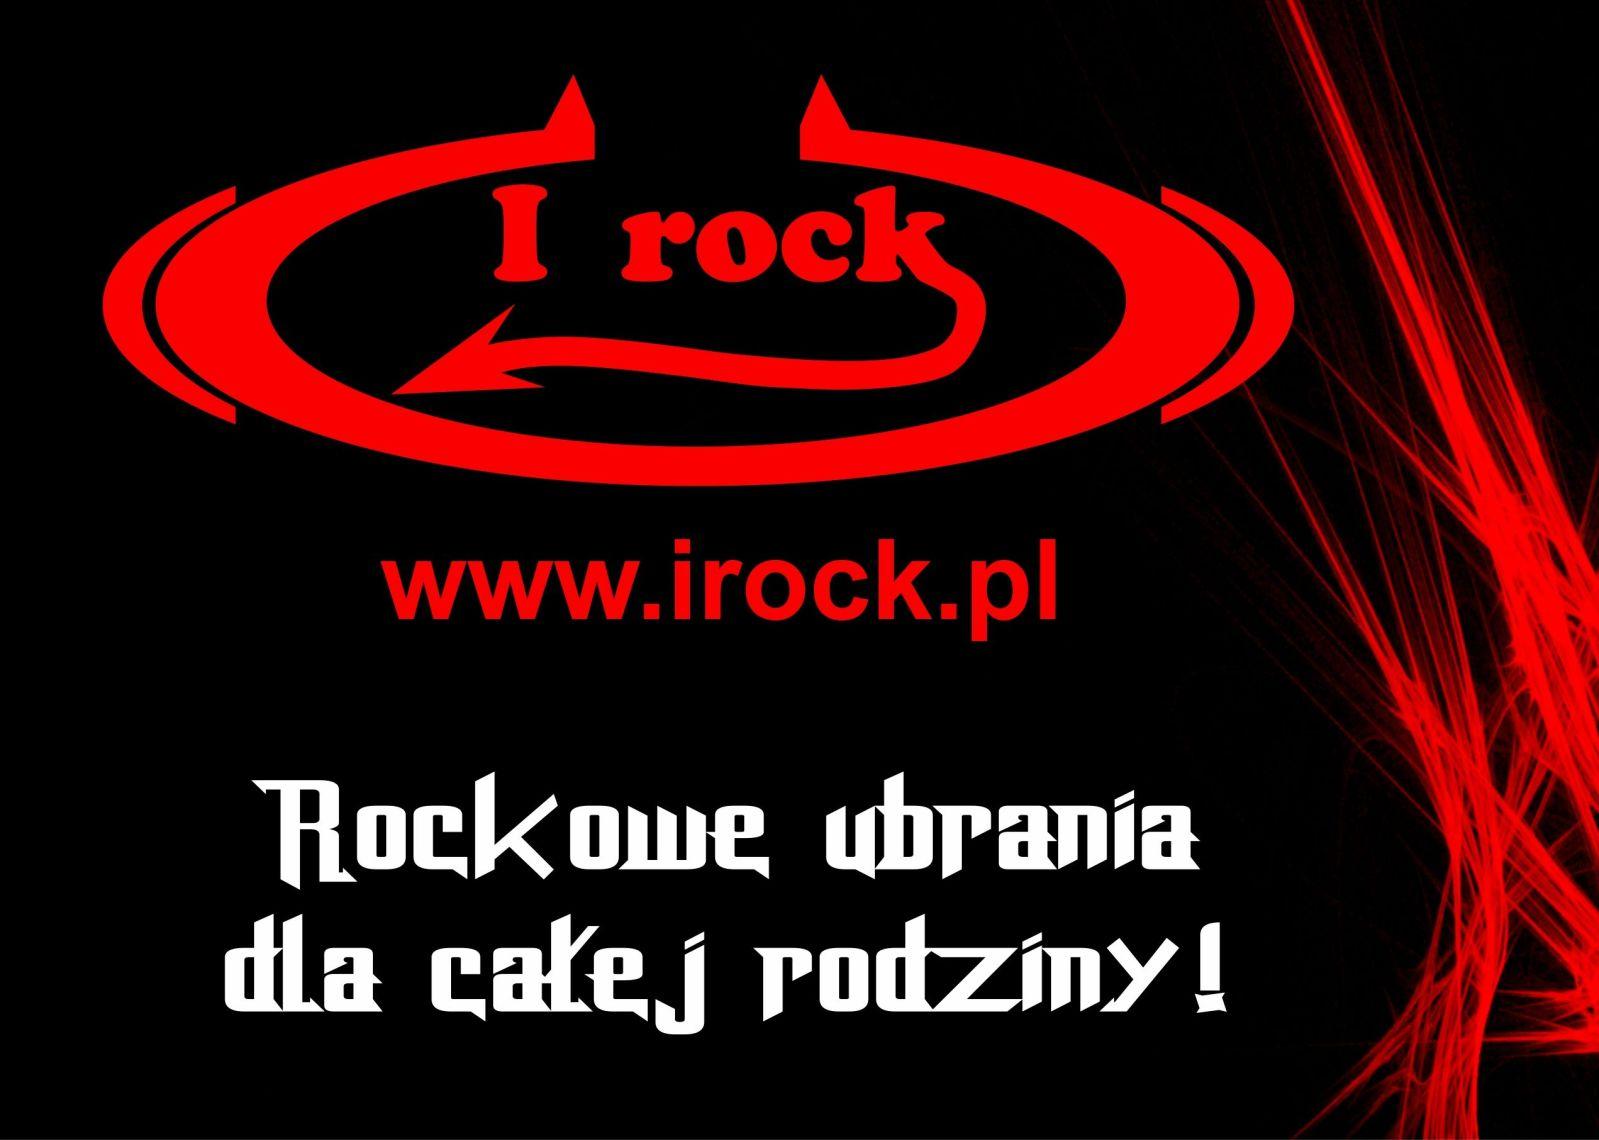 irock.pl